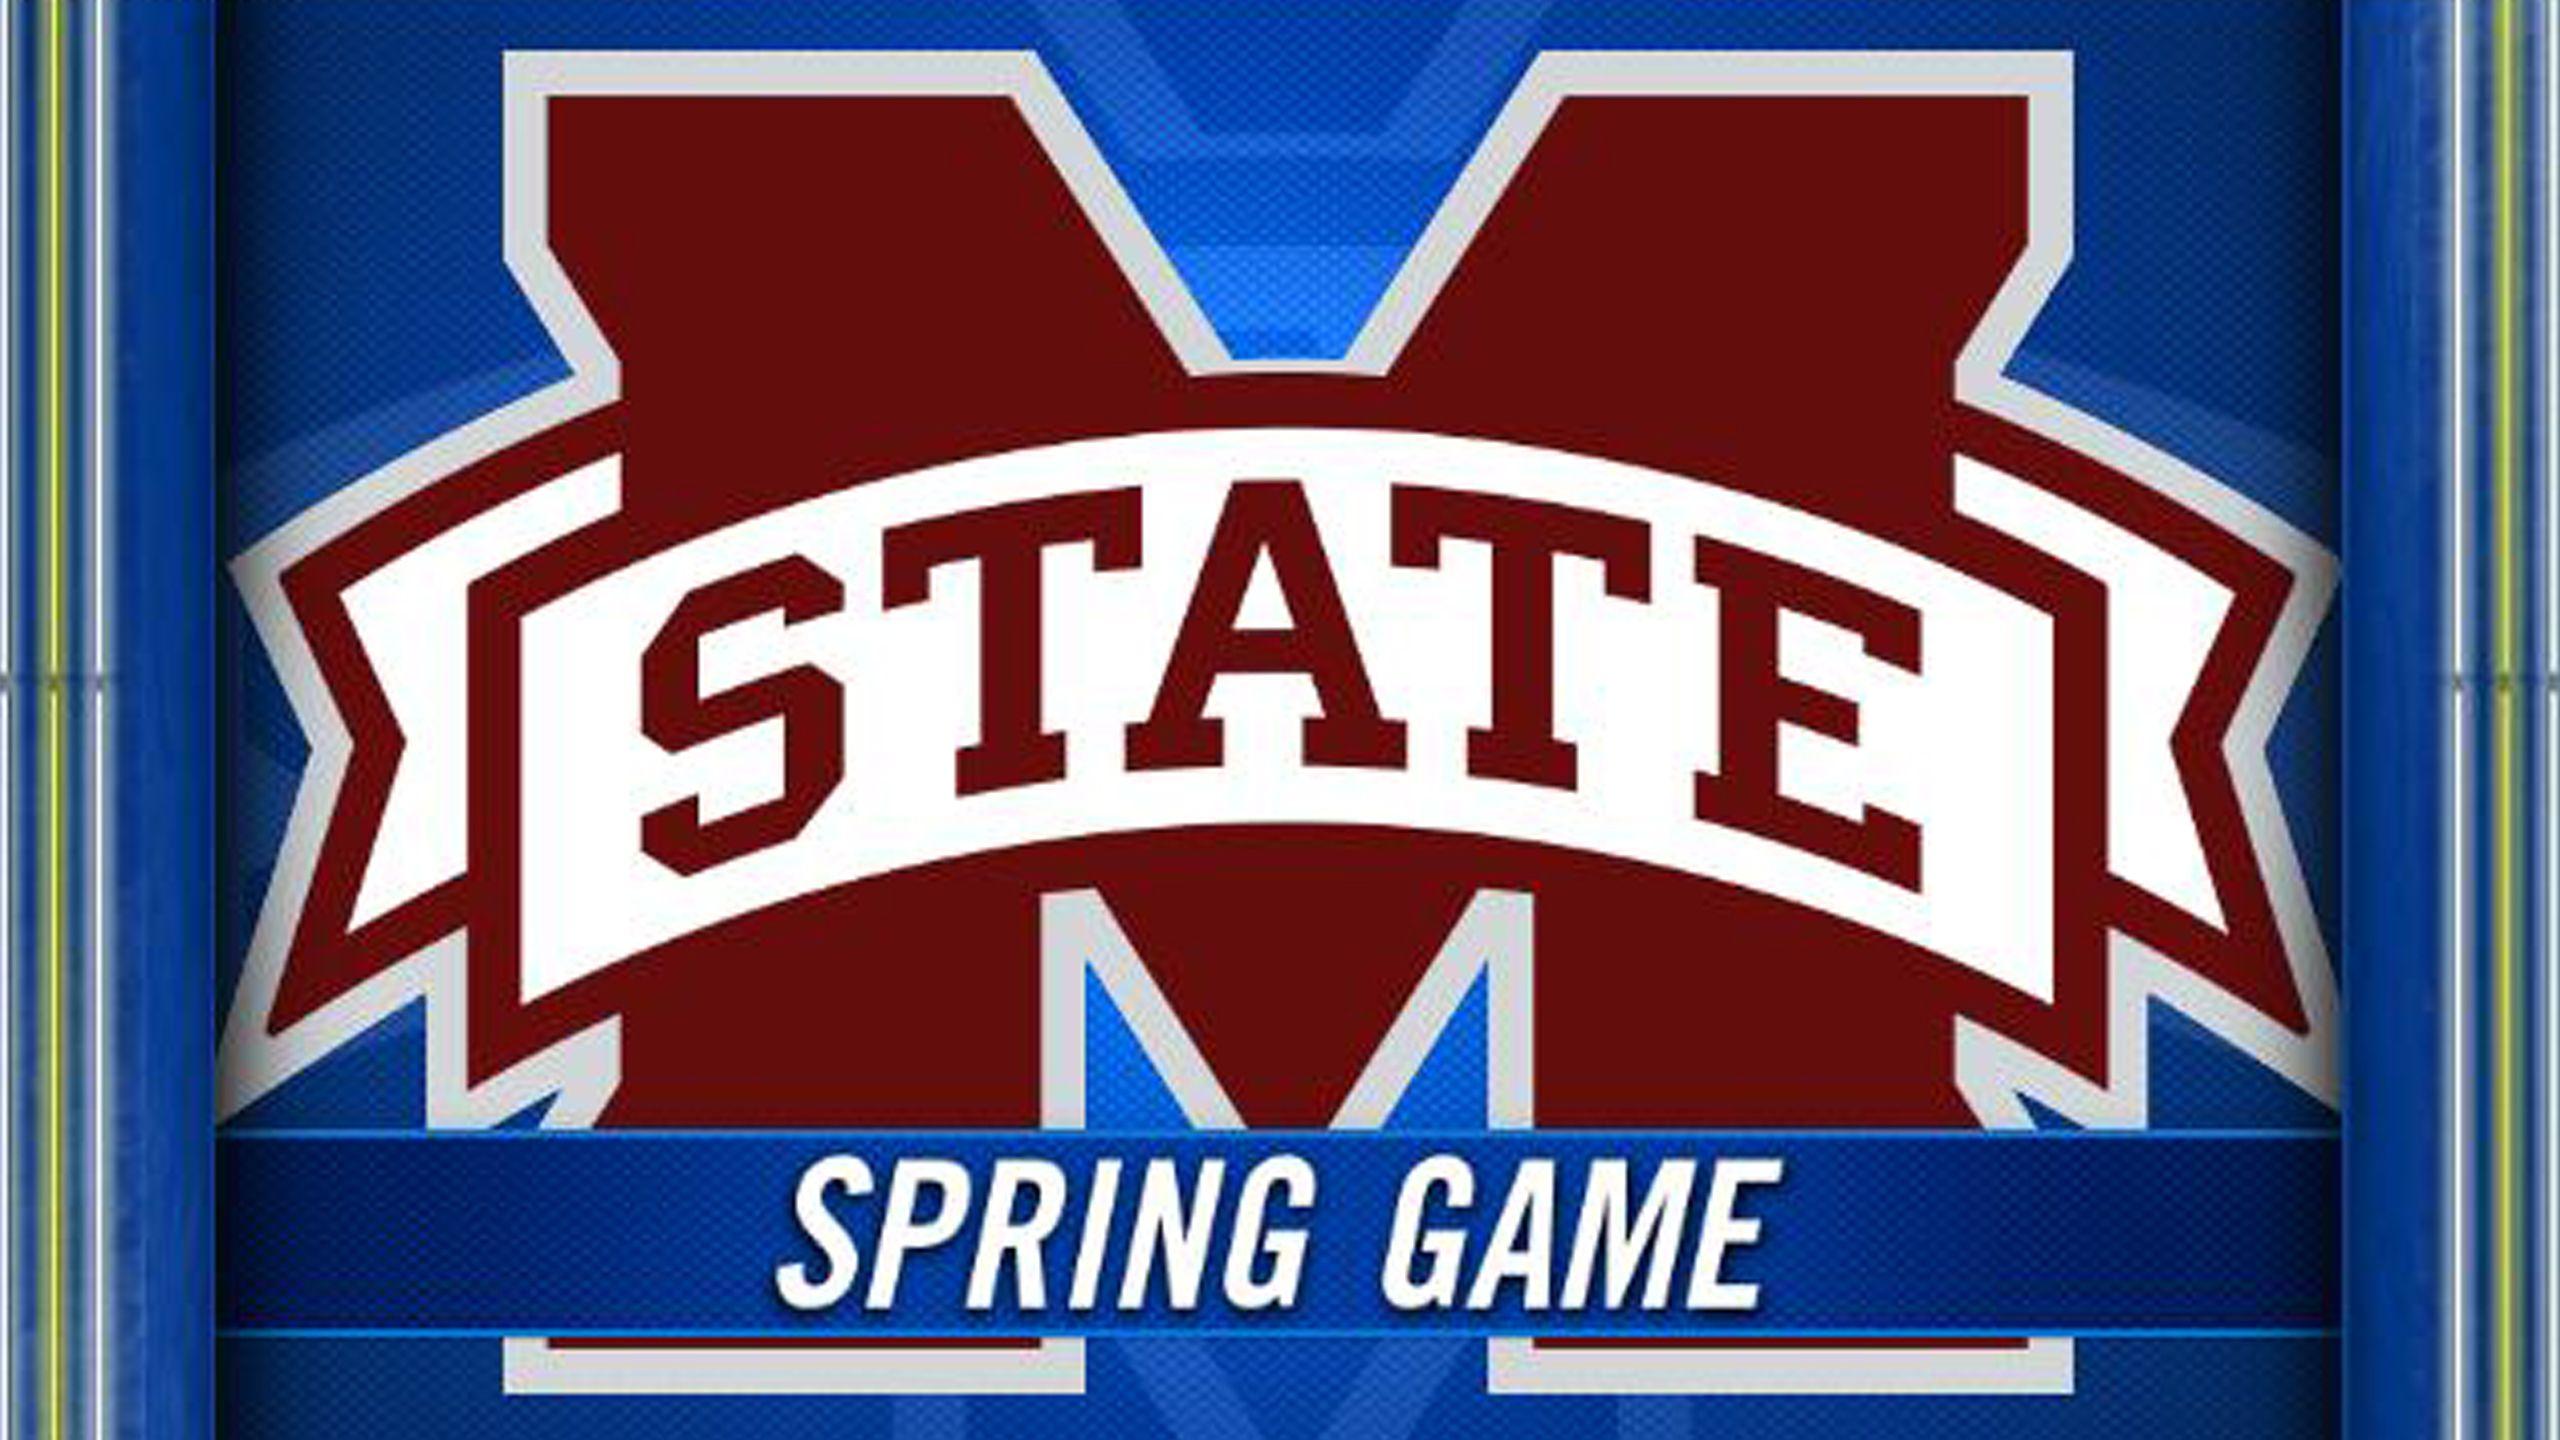 Mississippi State Spring Game